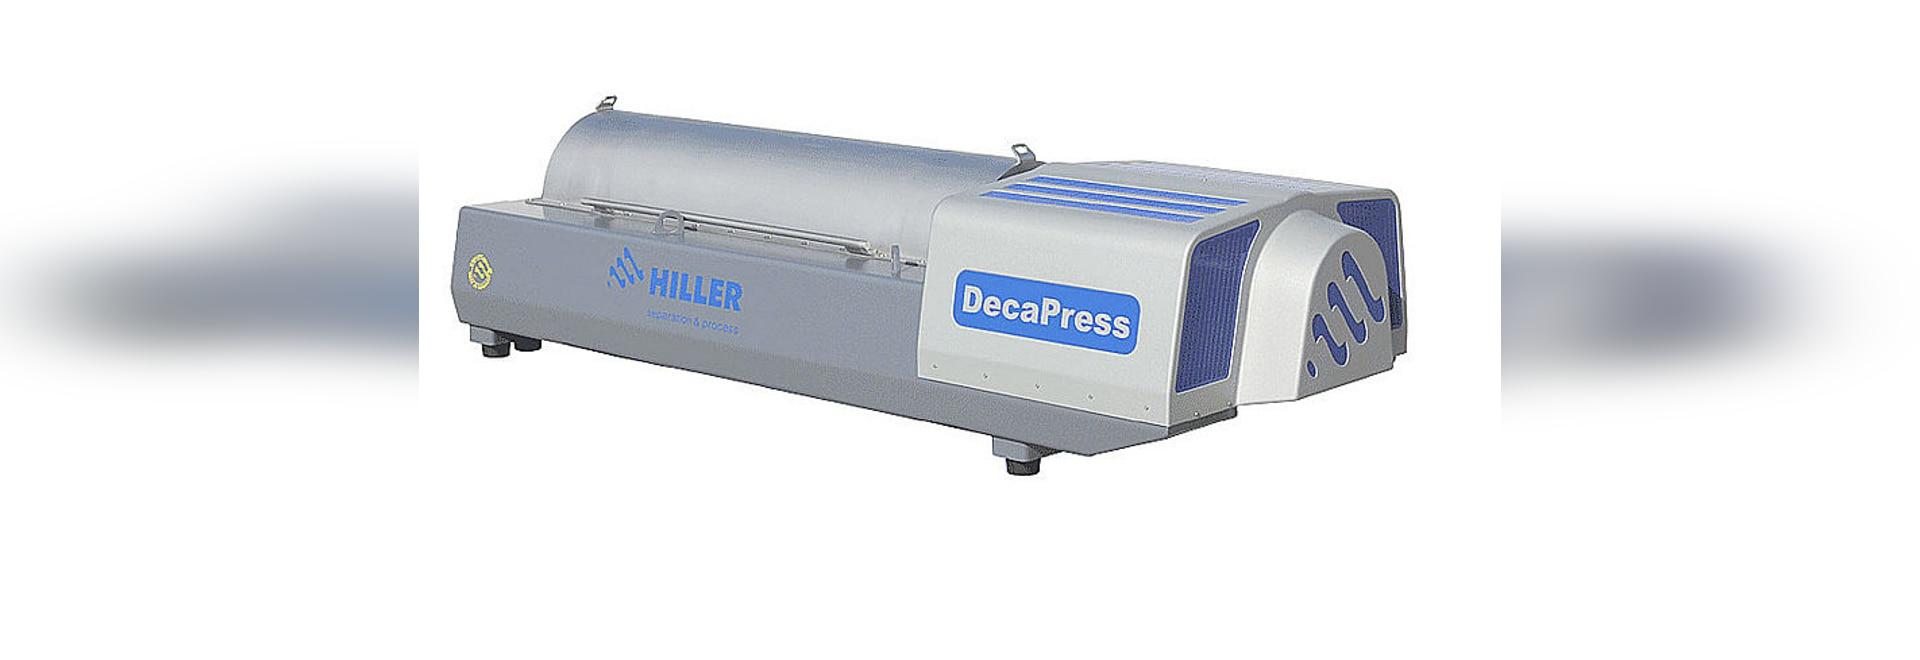 Weftec 2014 Hiller Decanter DP484